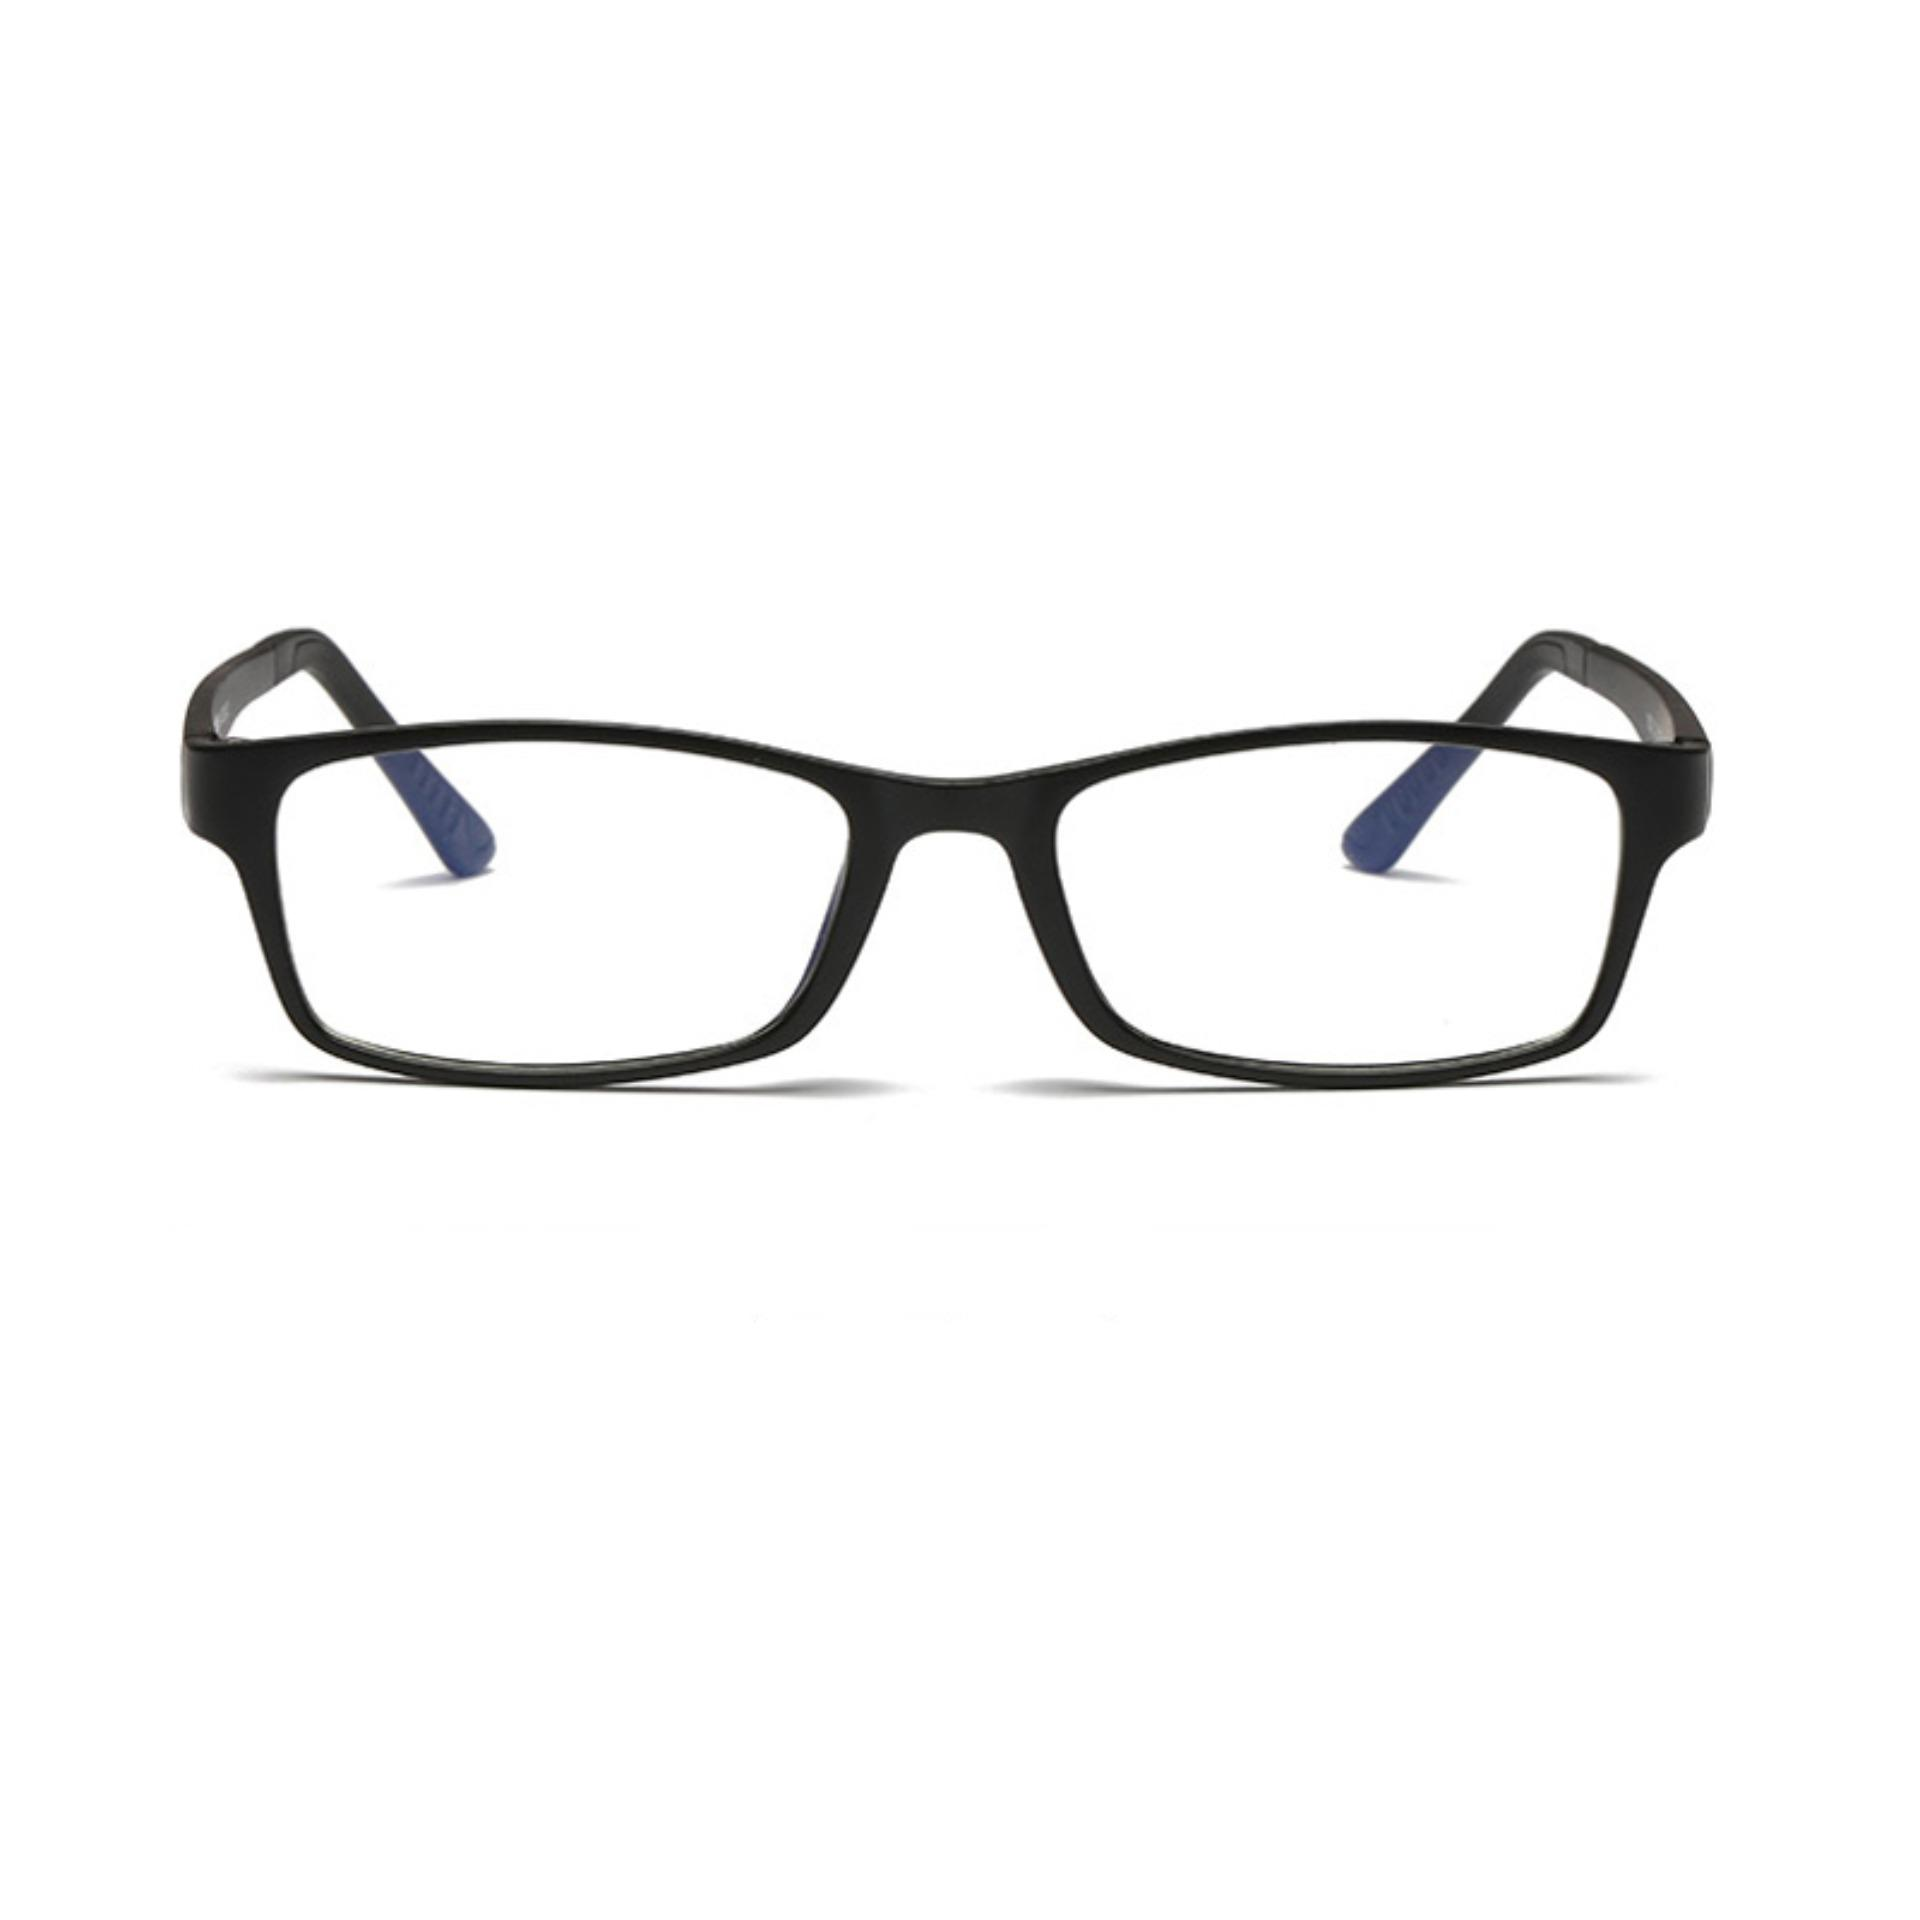 KATELUO ULTEM(PEI)- Tungsten Computer Goggles Anti Blue Laser Fatigue Radiation-resistant Eyeglasses Glasses Frame 1302 | Lazada PH